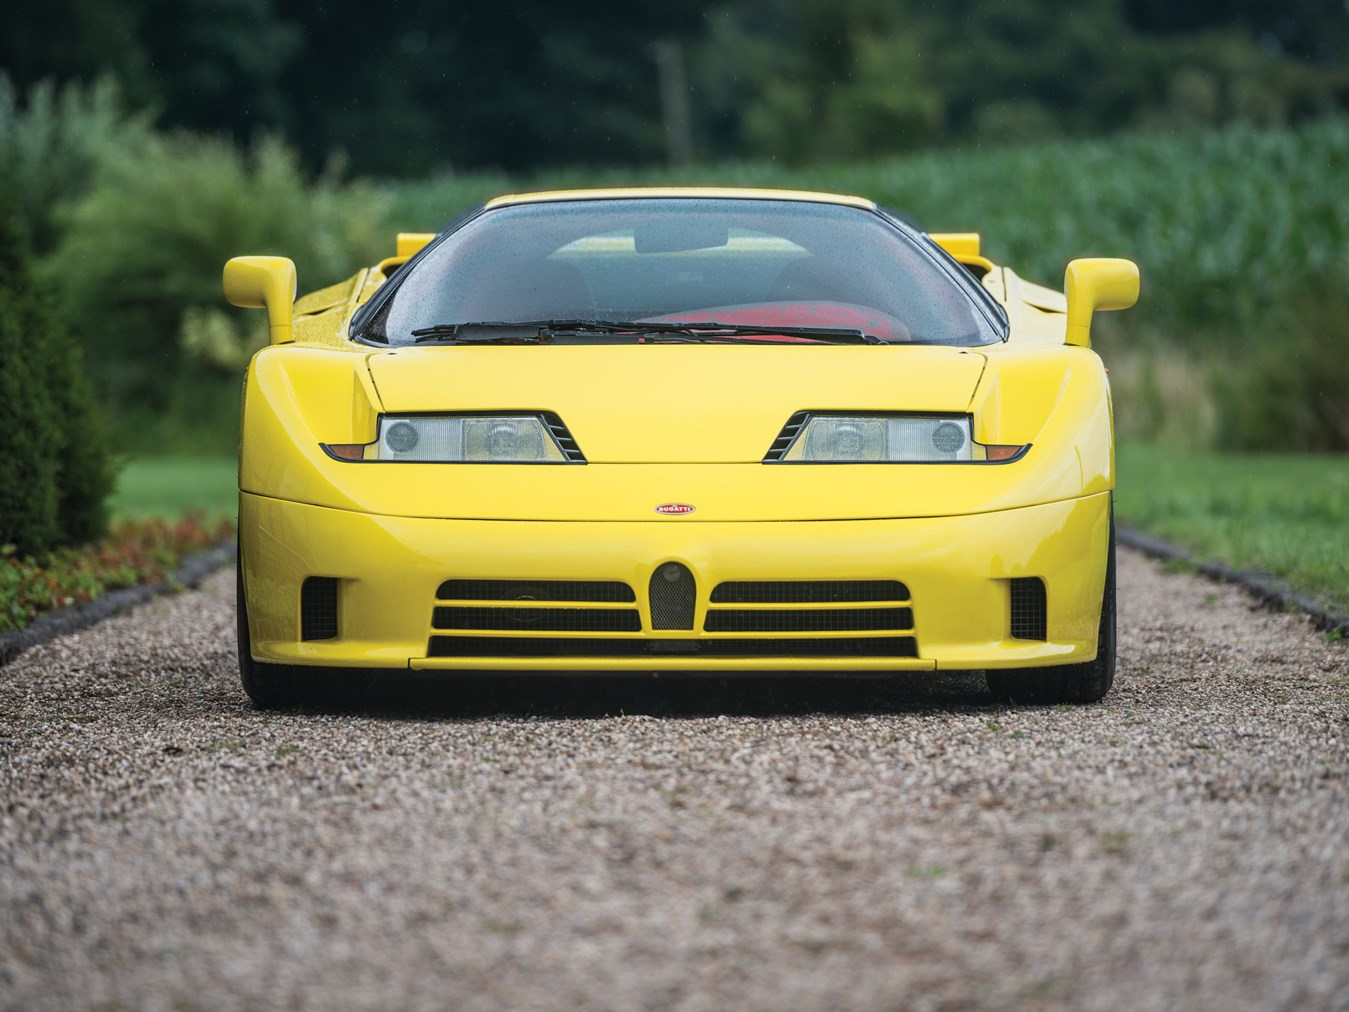 rm sotheby's - 1995 bugatti eb110 super sport | london 2015